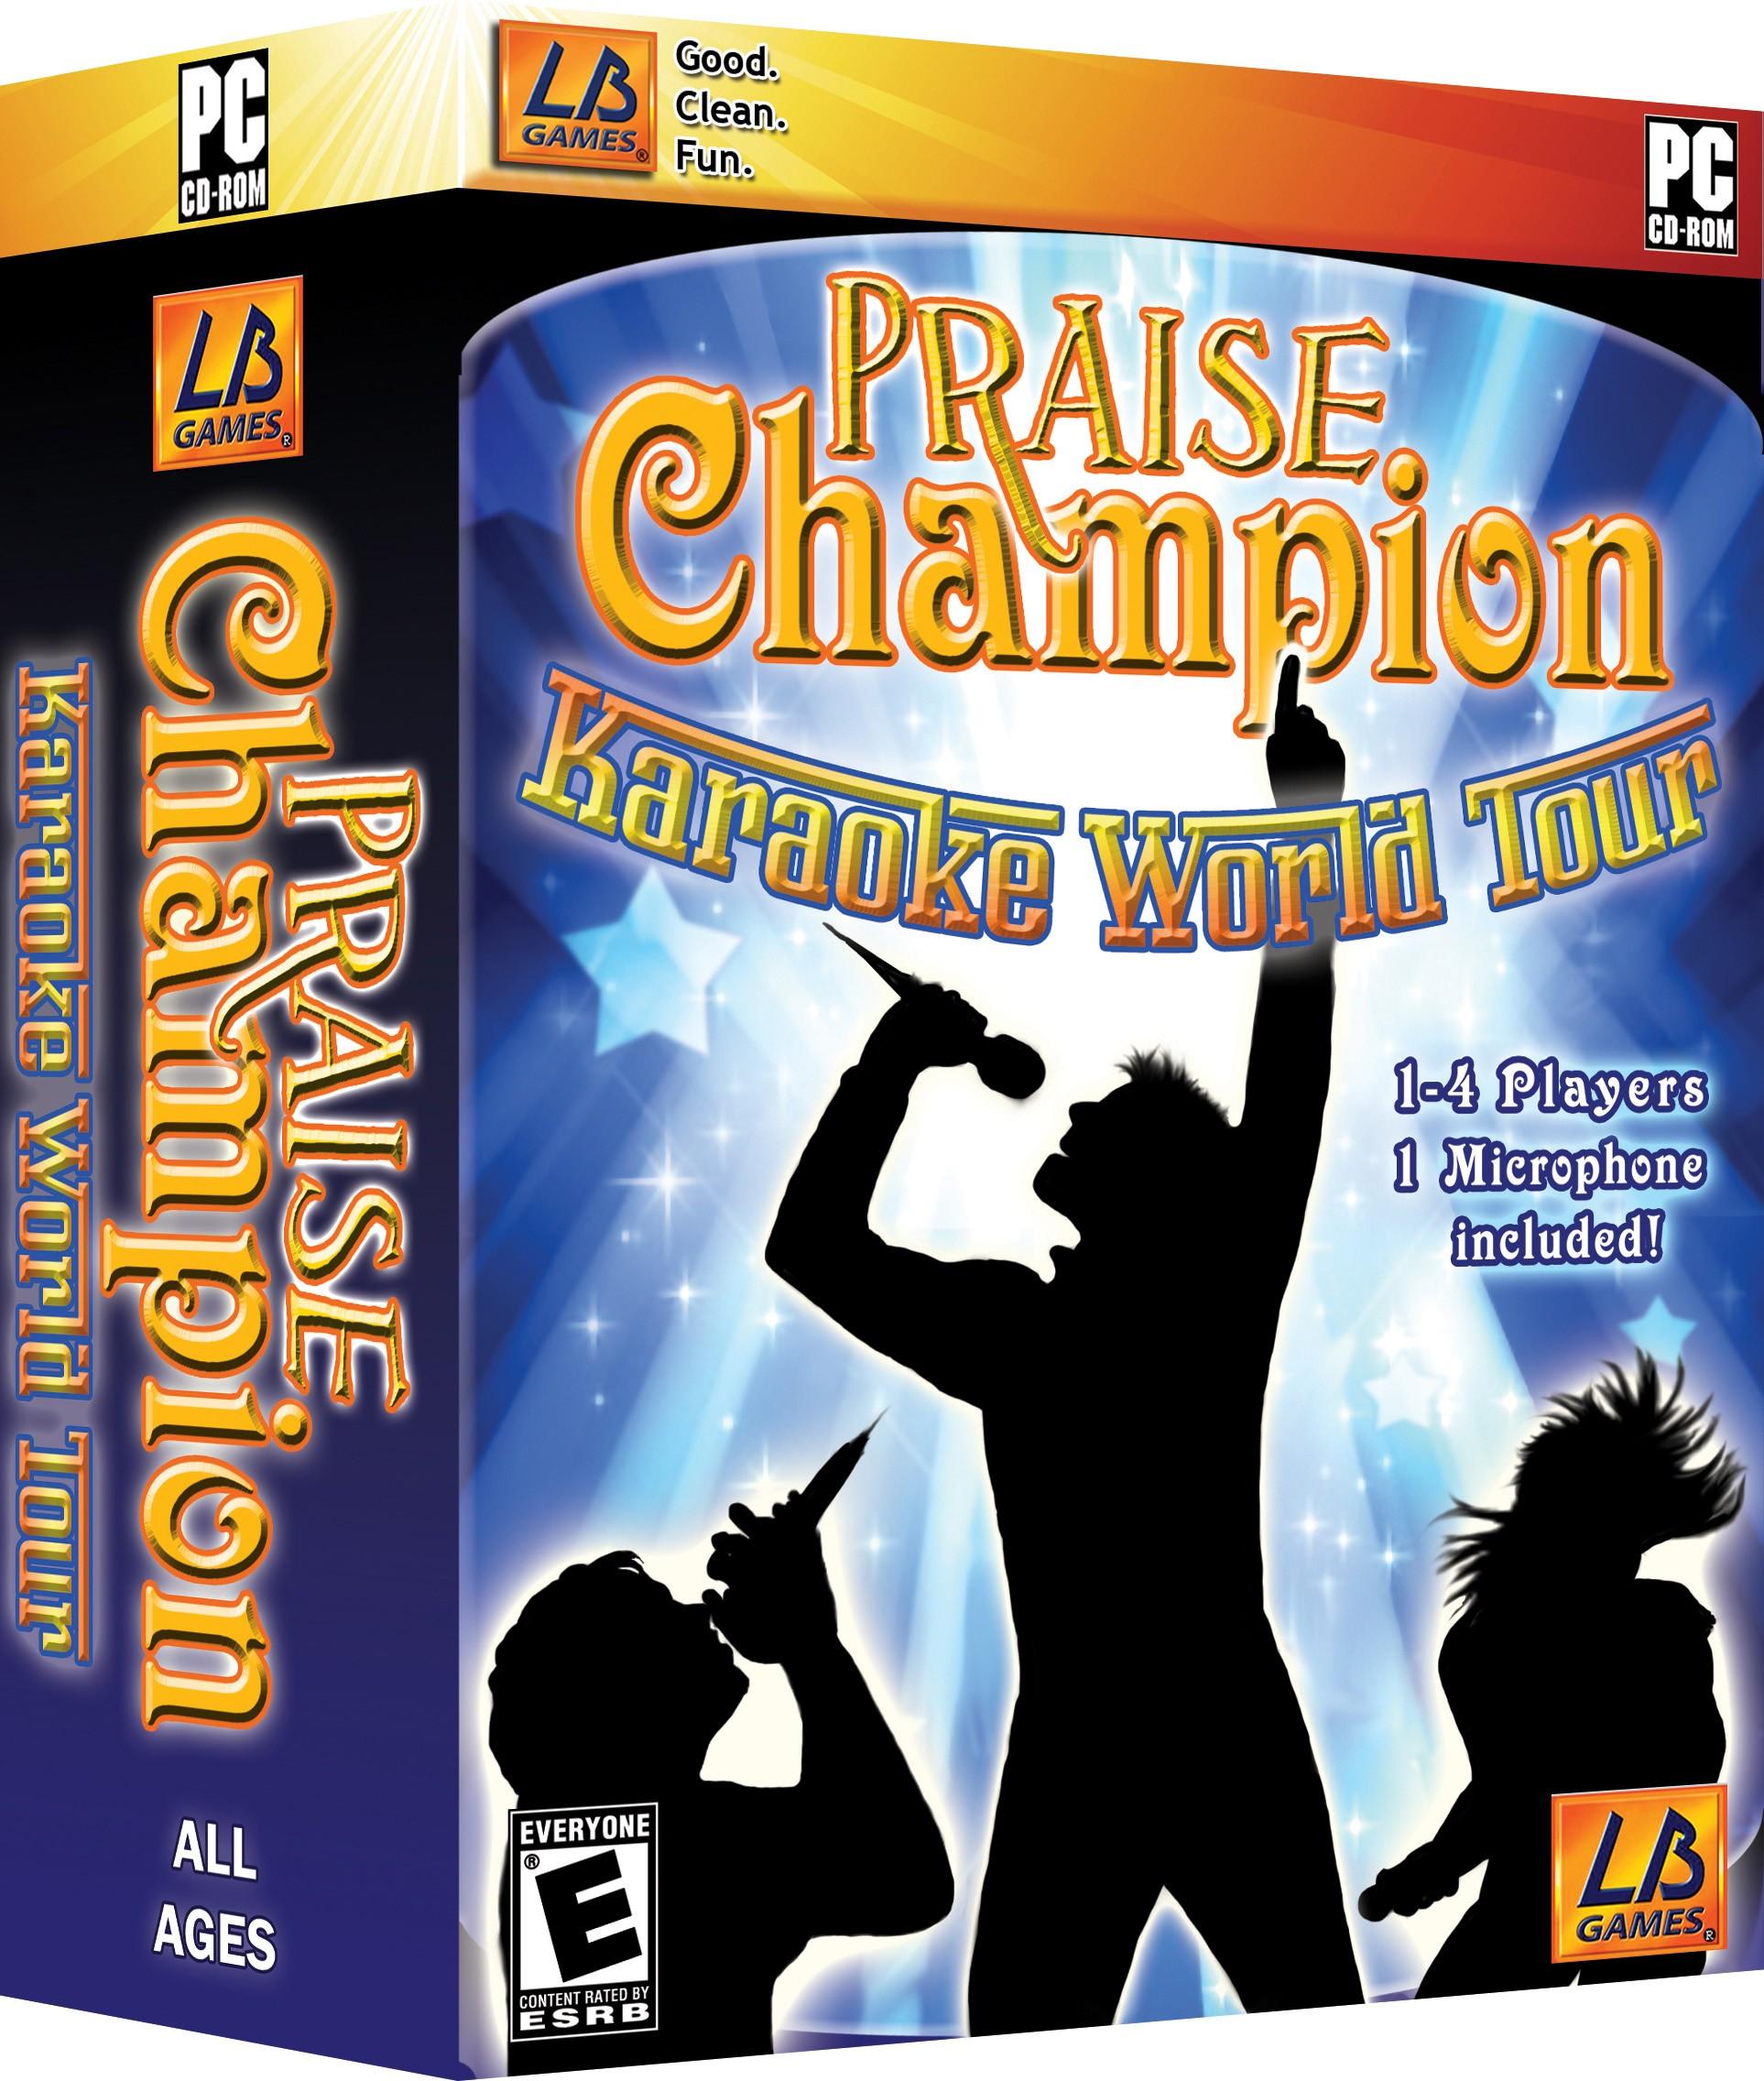 Heavenly Harmony Karaoke is now Praise Champion